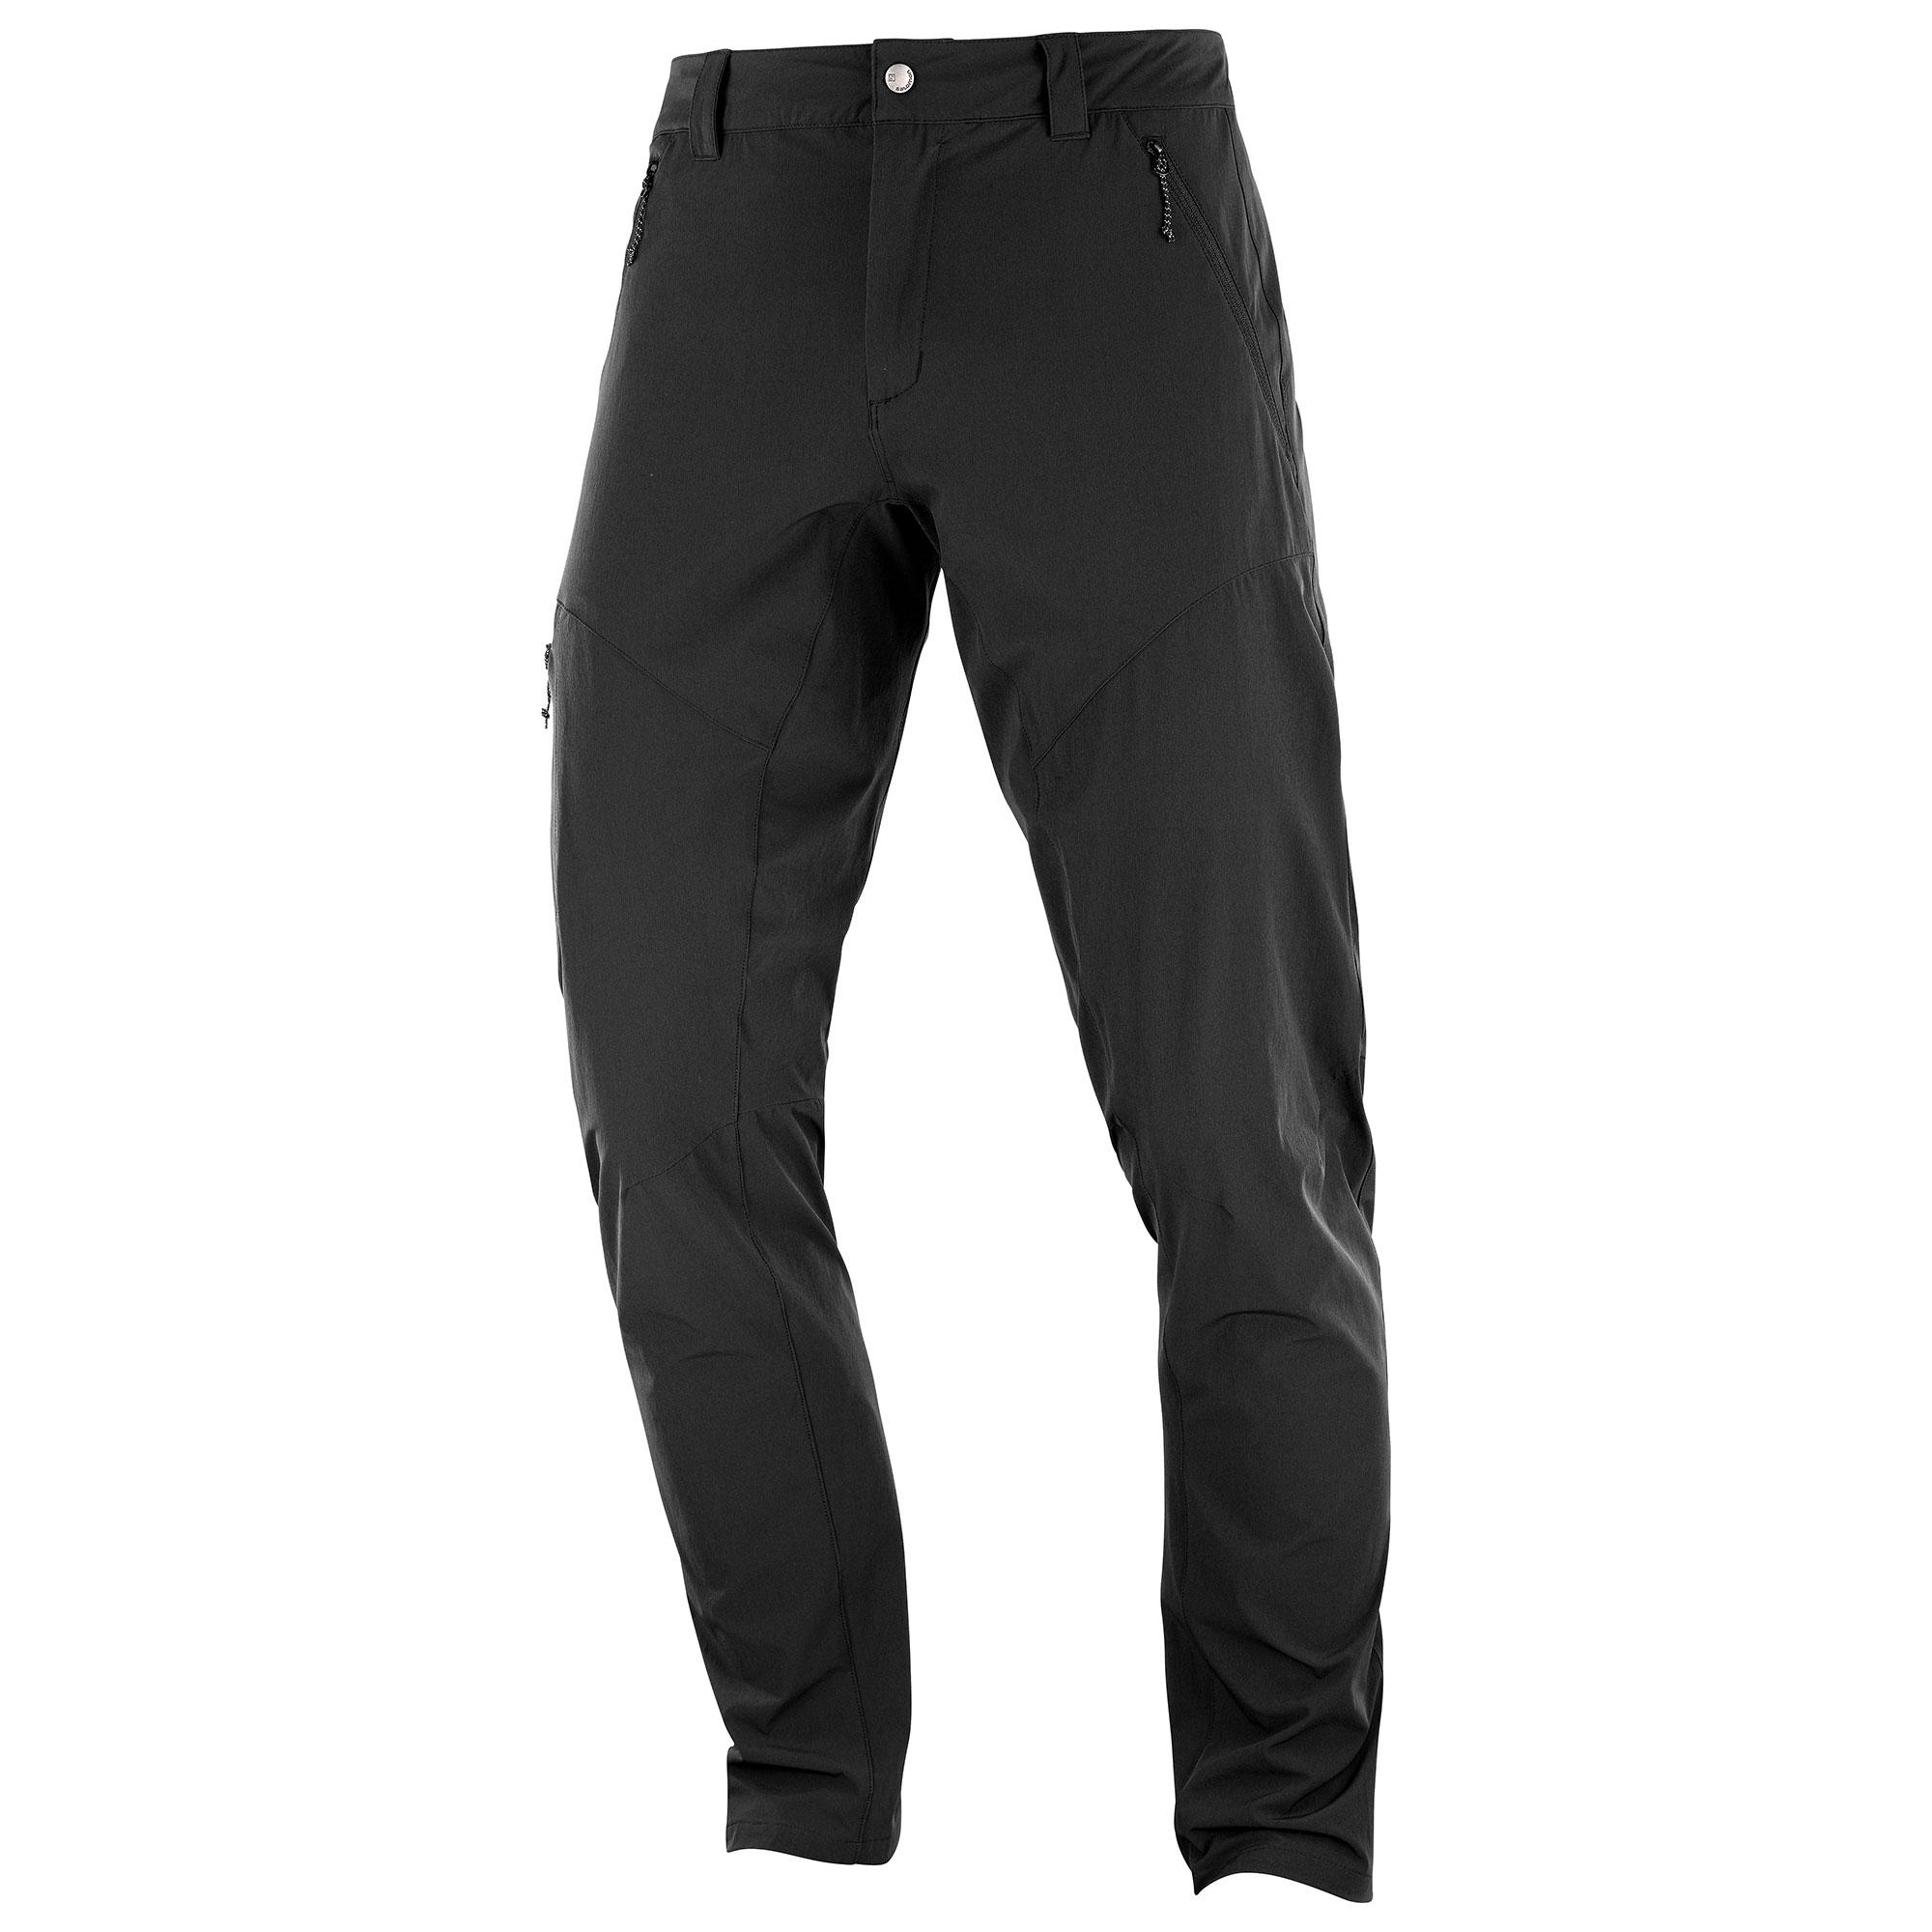 Wayfarer Tapered Pant Black - Men's